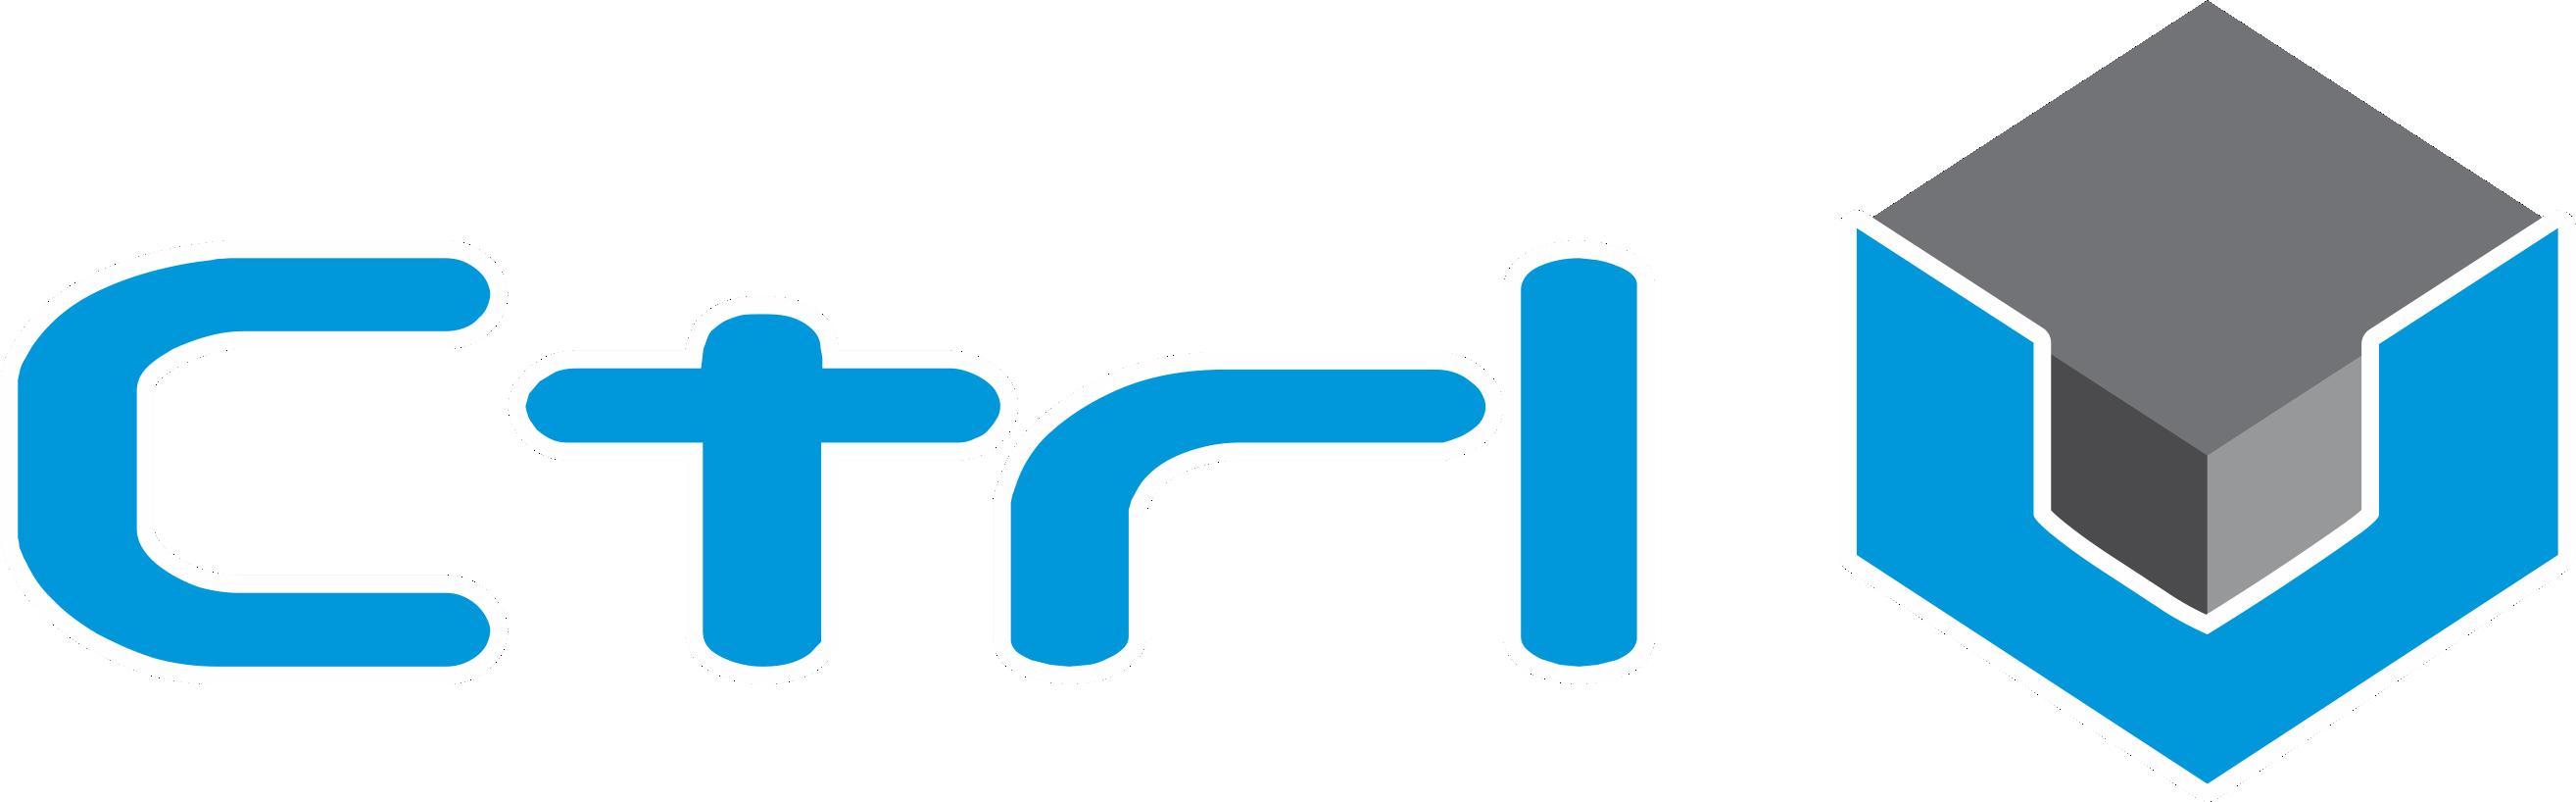 Virtual Reality Franchising - Ctrl V | VR Arcade